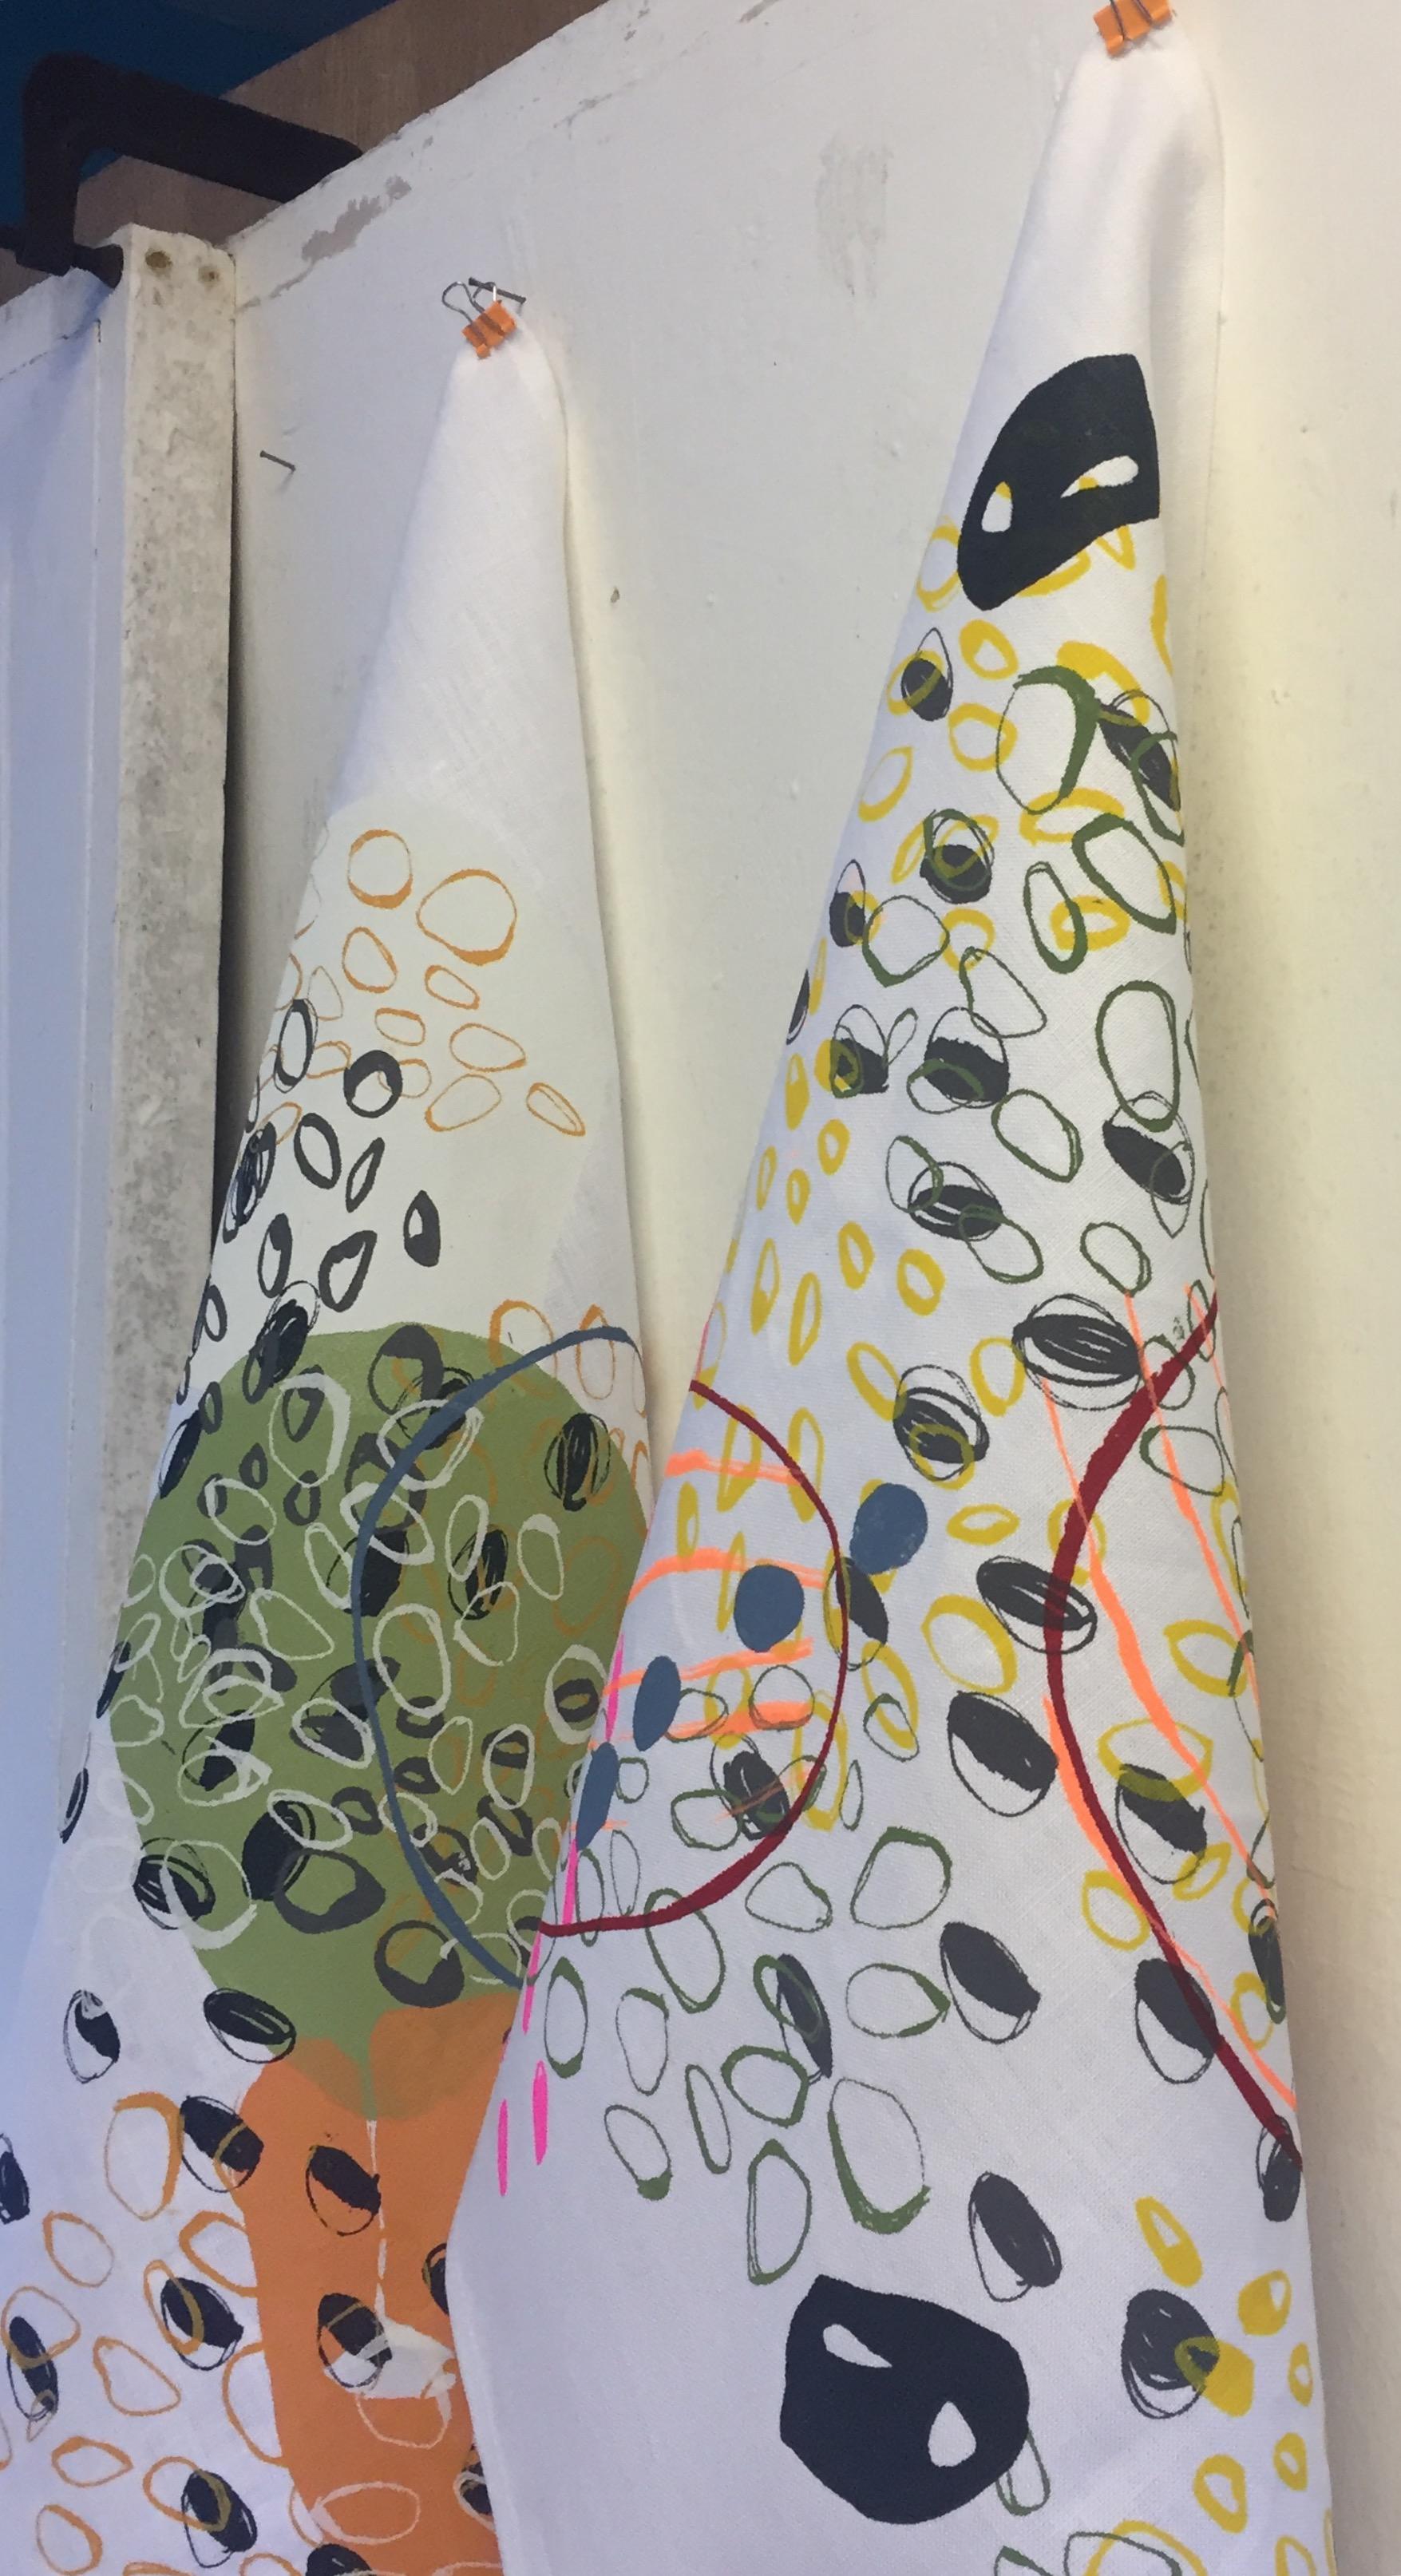 Art Towel